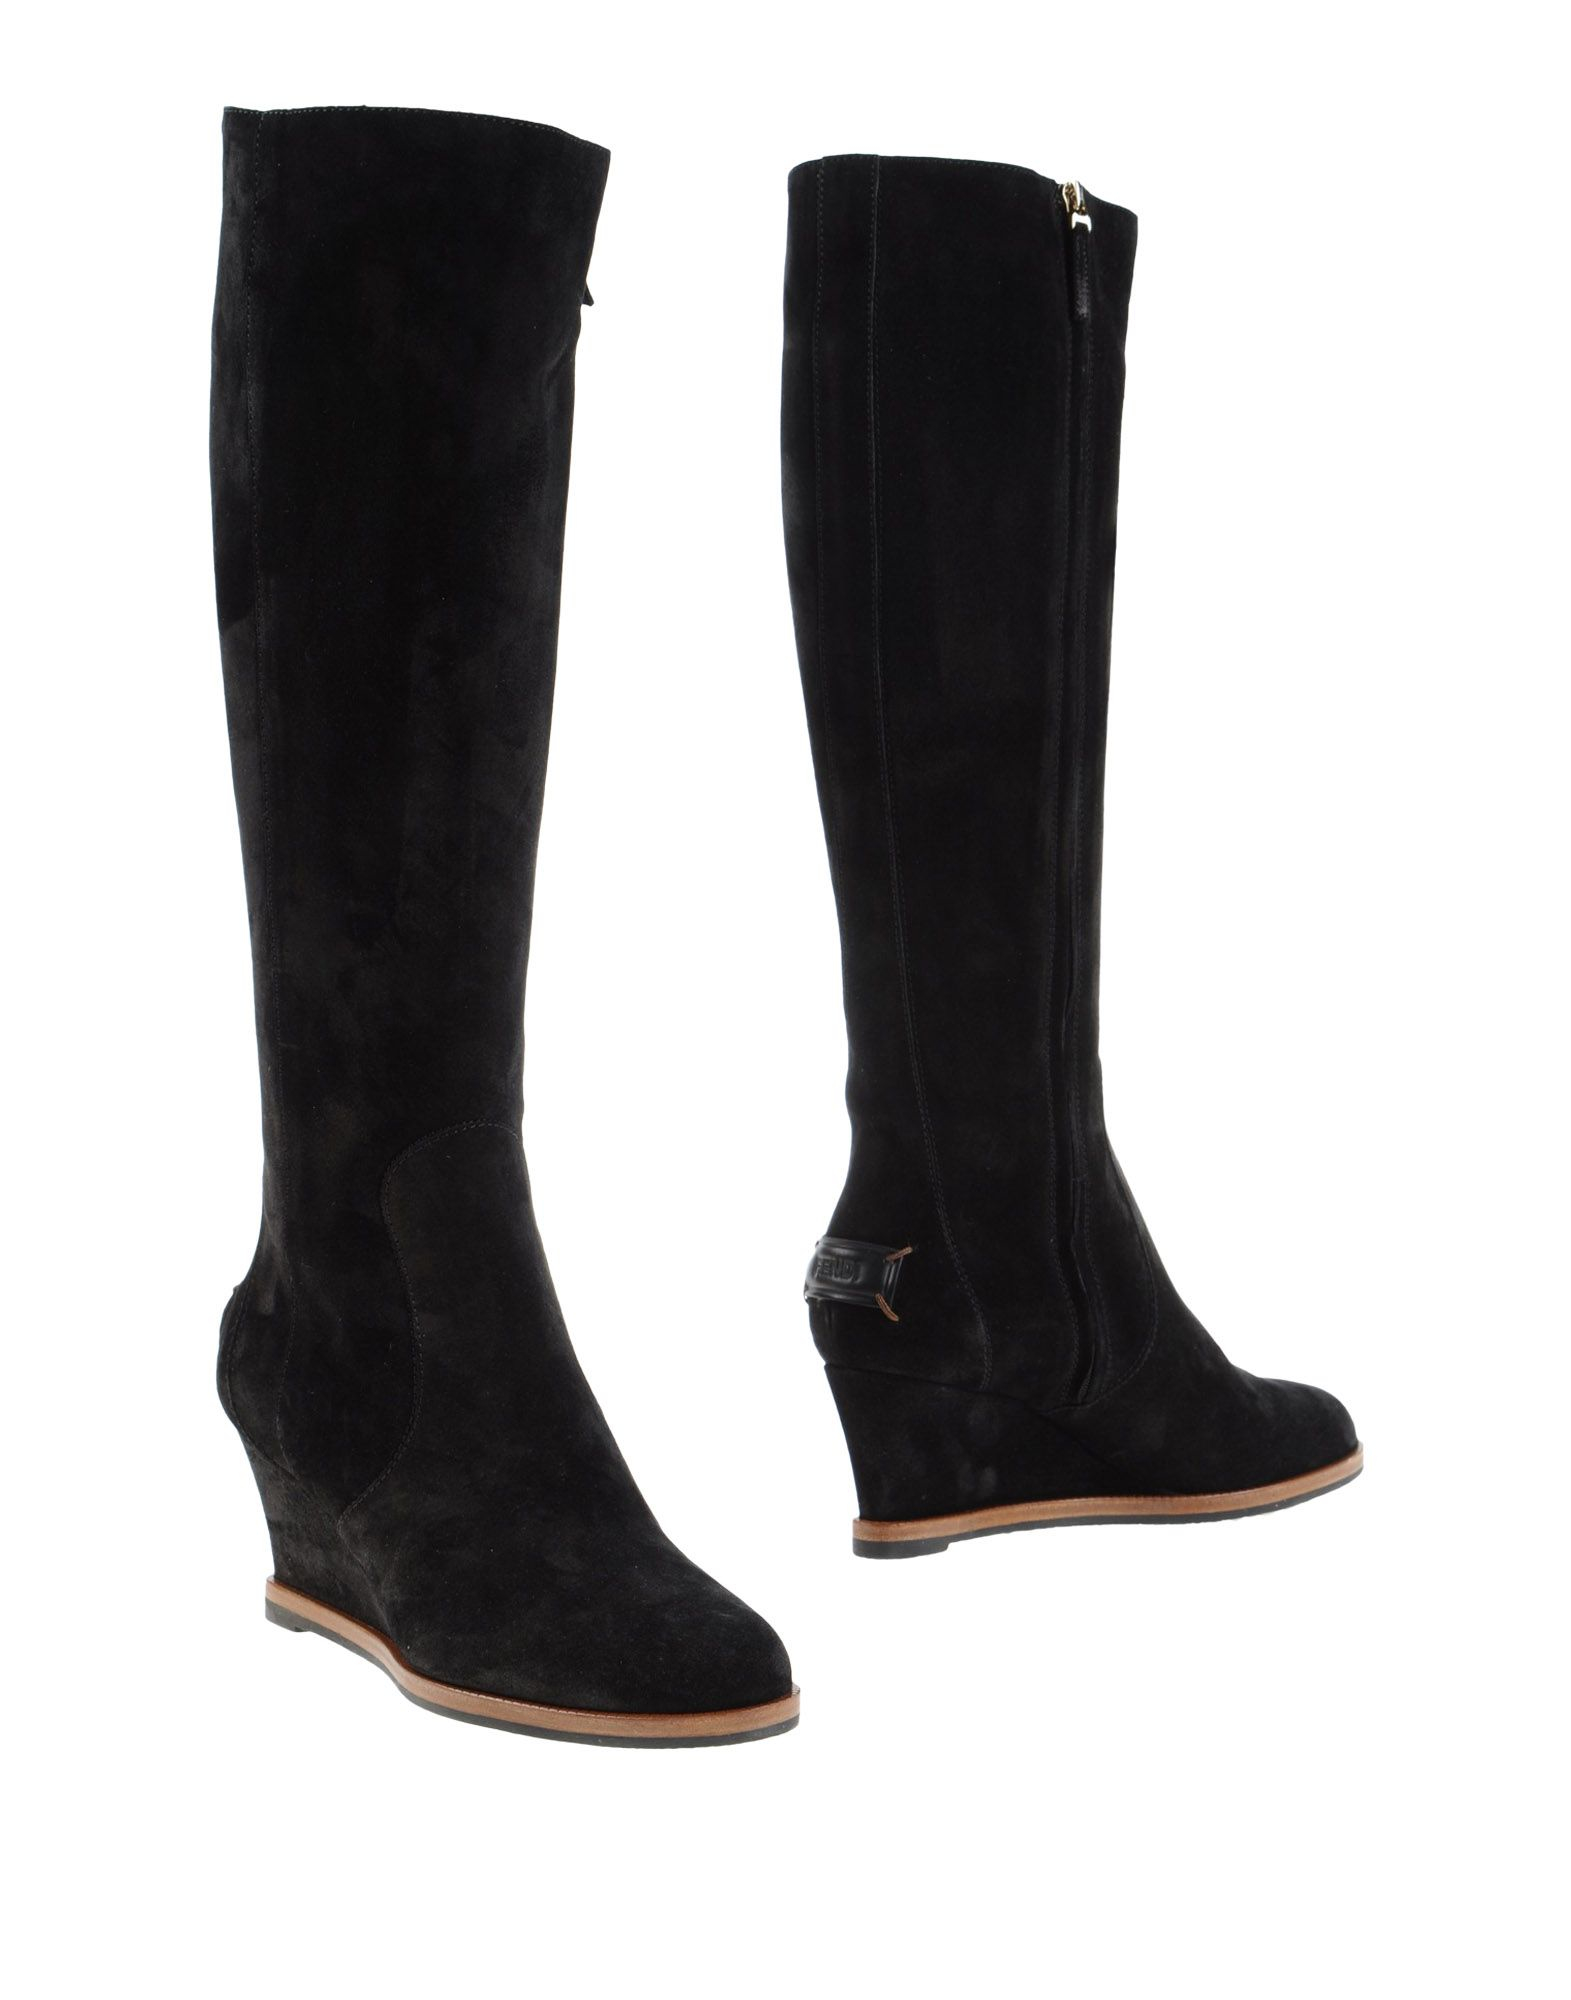 fendi suede knee high wedge boots in black lyst